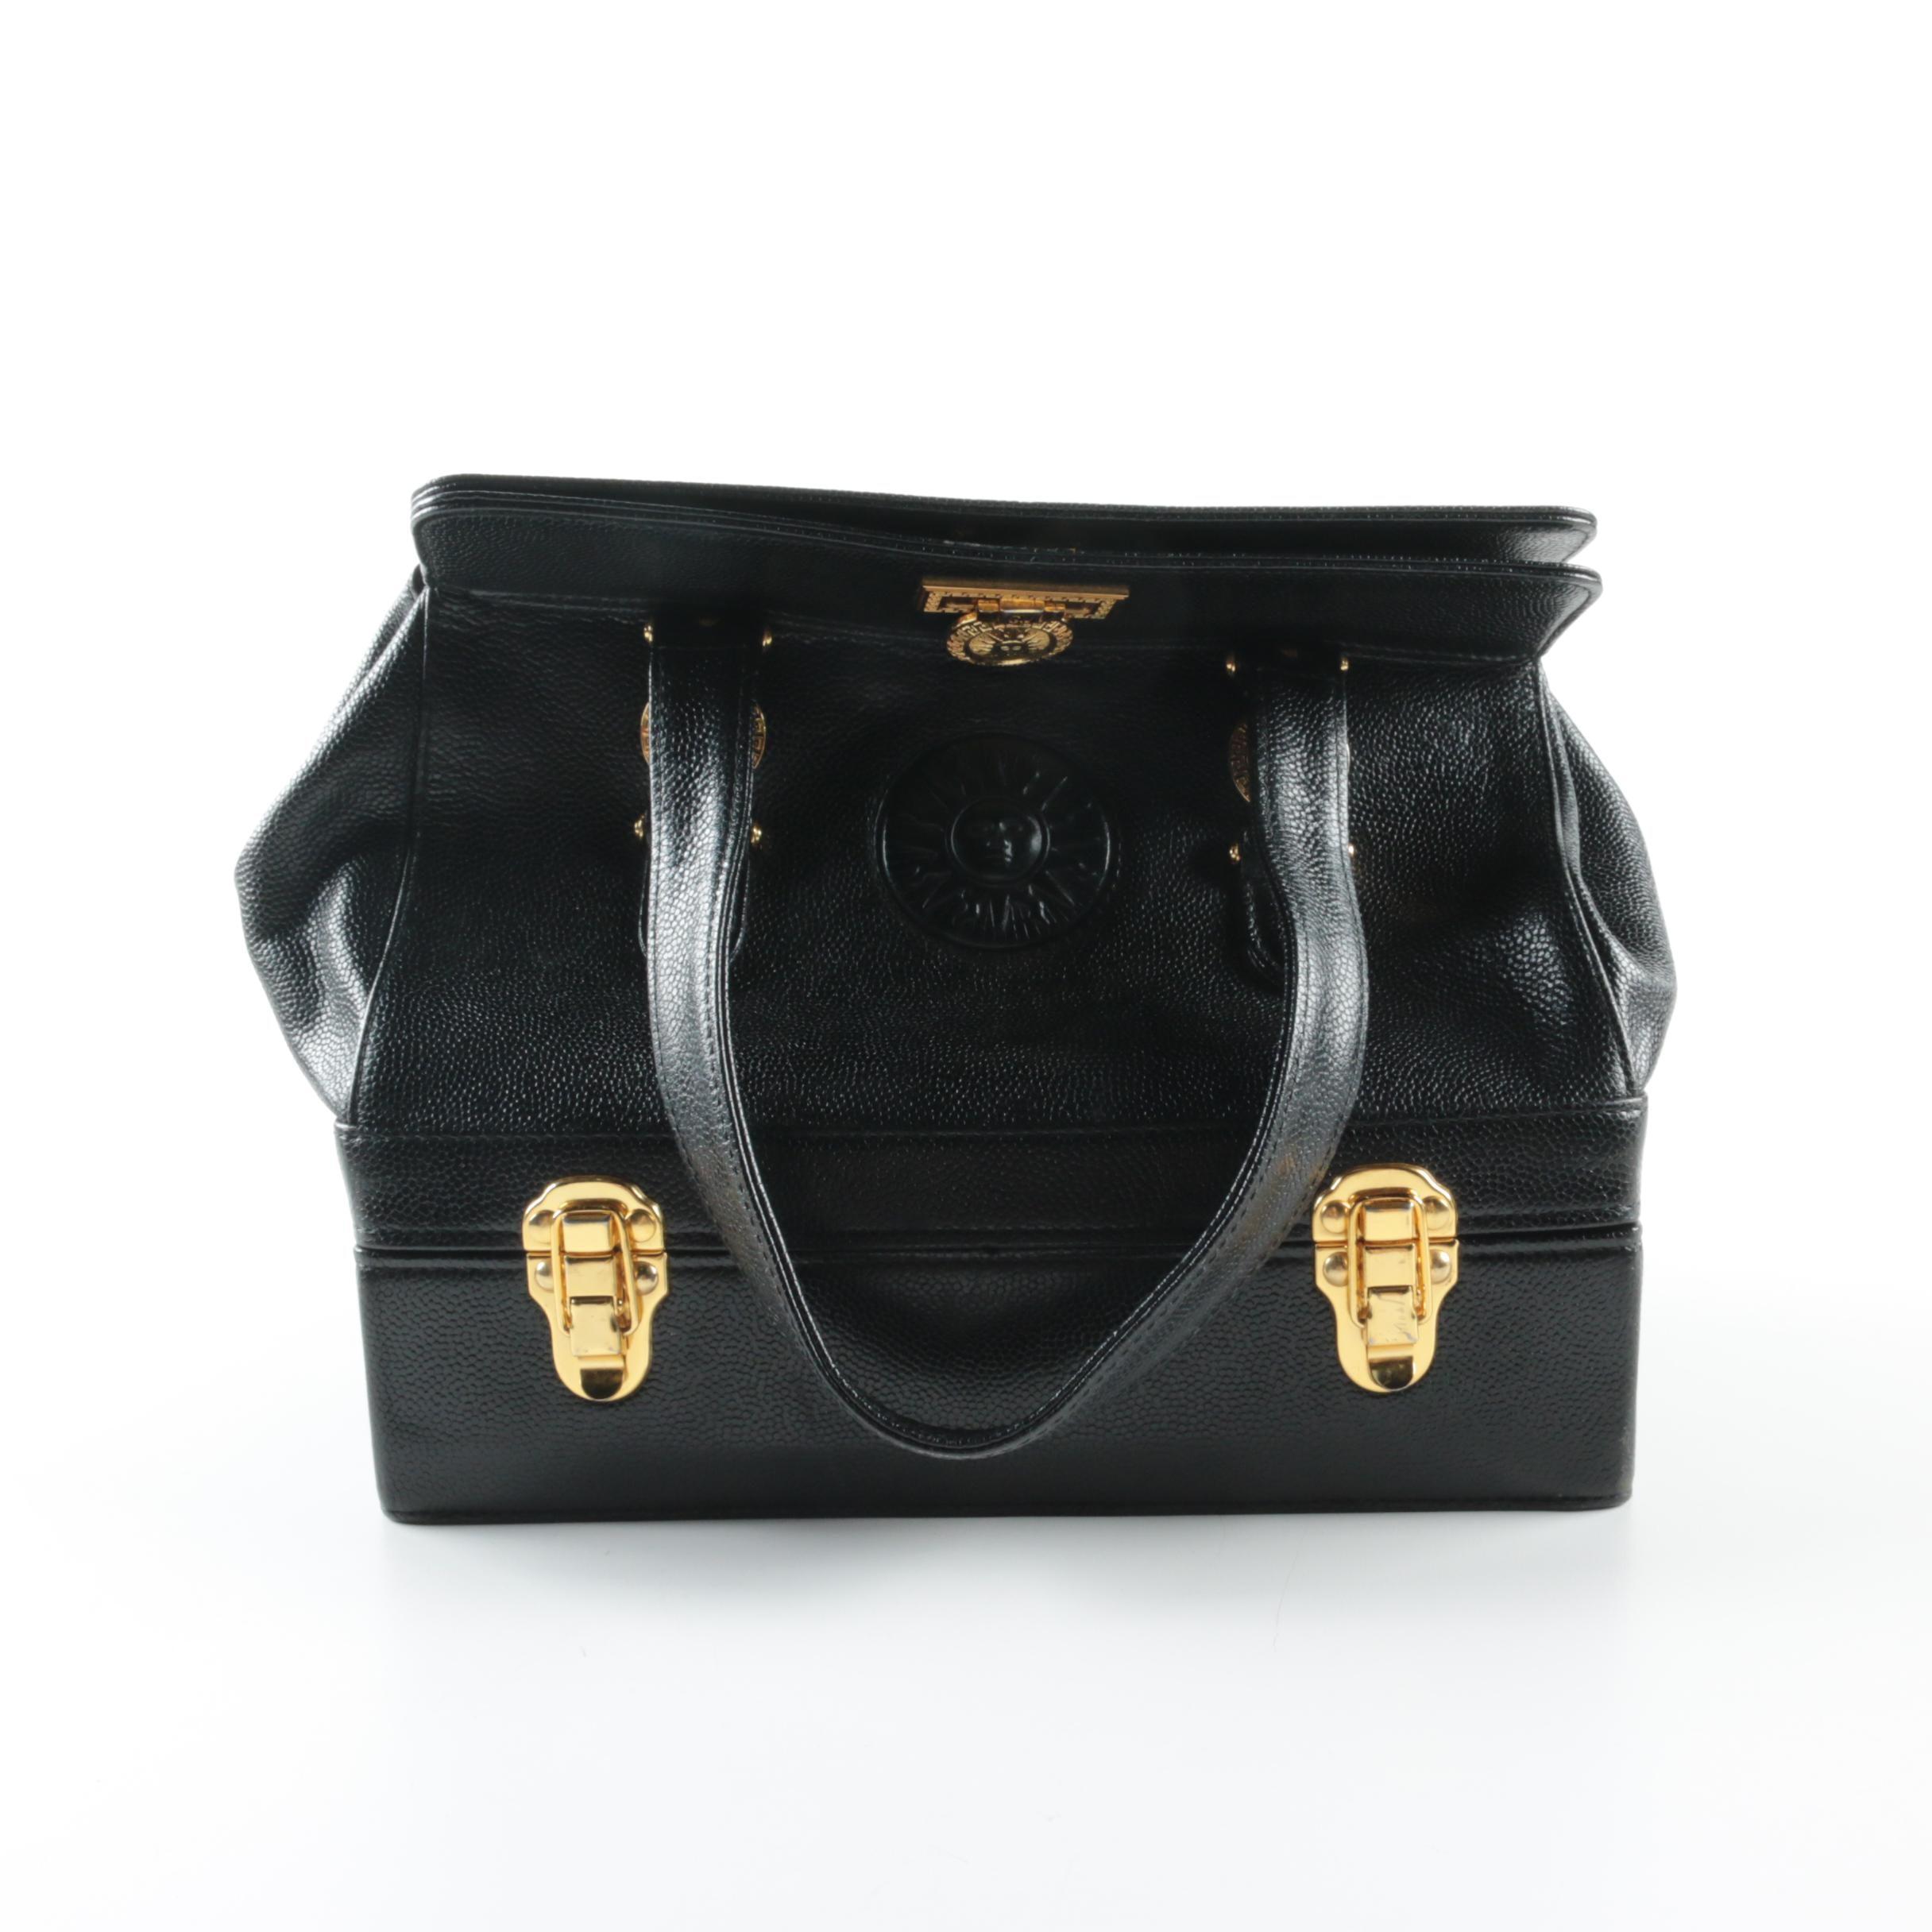 Vintage Gianni Versace Black Leather Sunburst Satchel